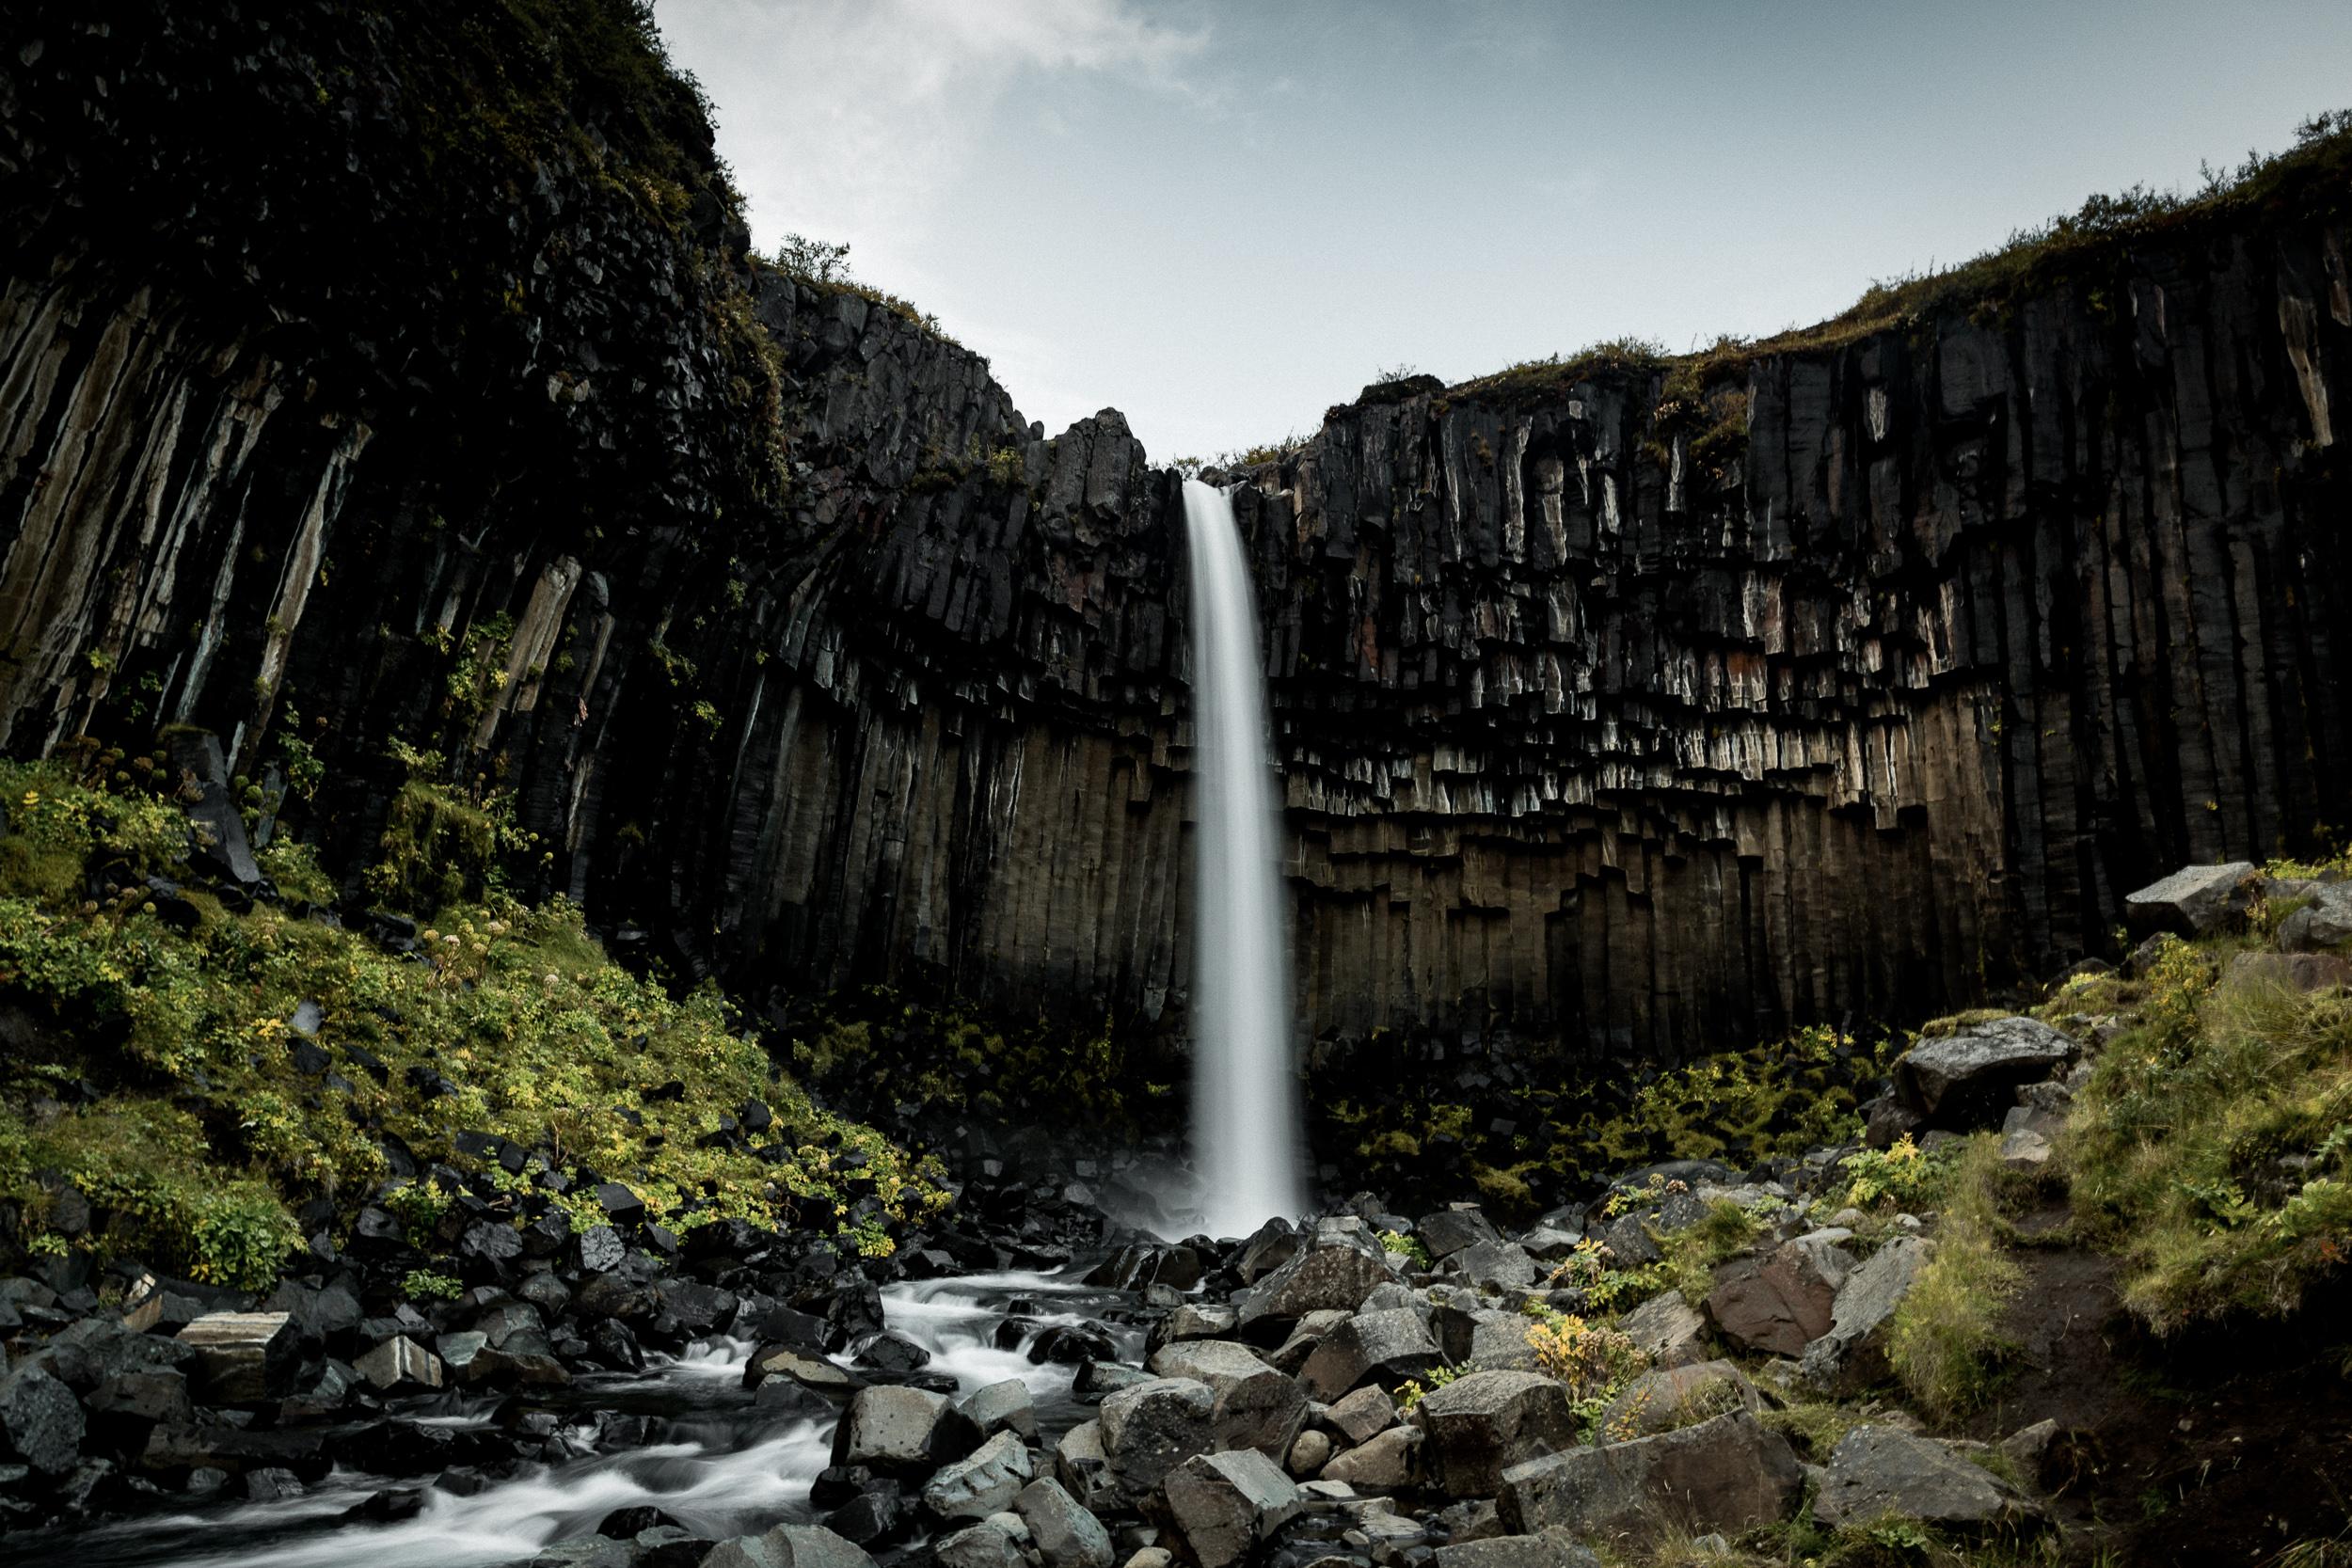 14-iceland-svartifoss-waterfall-basalt-column-anna-elina-lahti-photographer.jpg